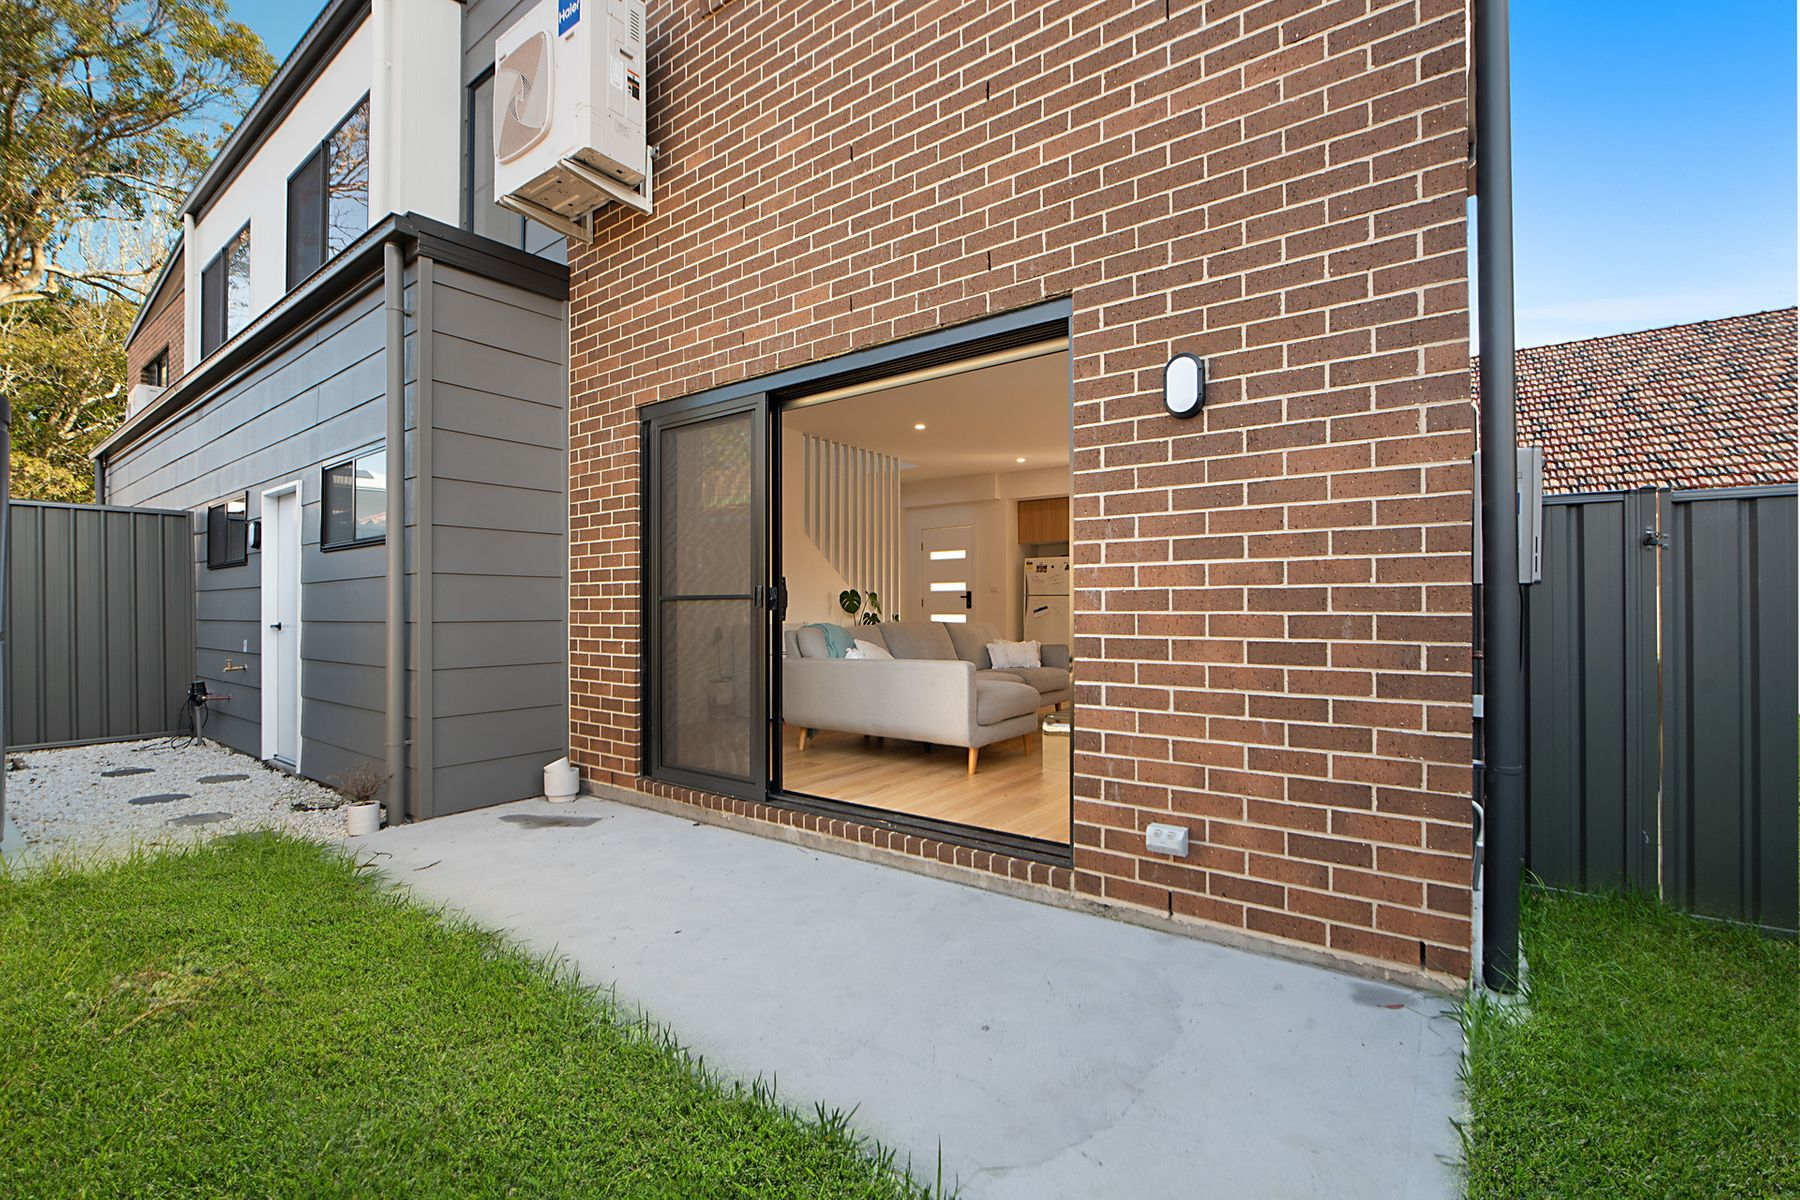 3/391 Glebe Road, Merewether, NSW 2291